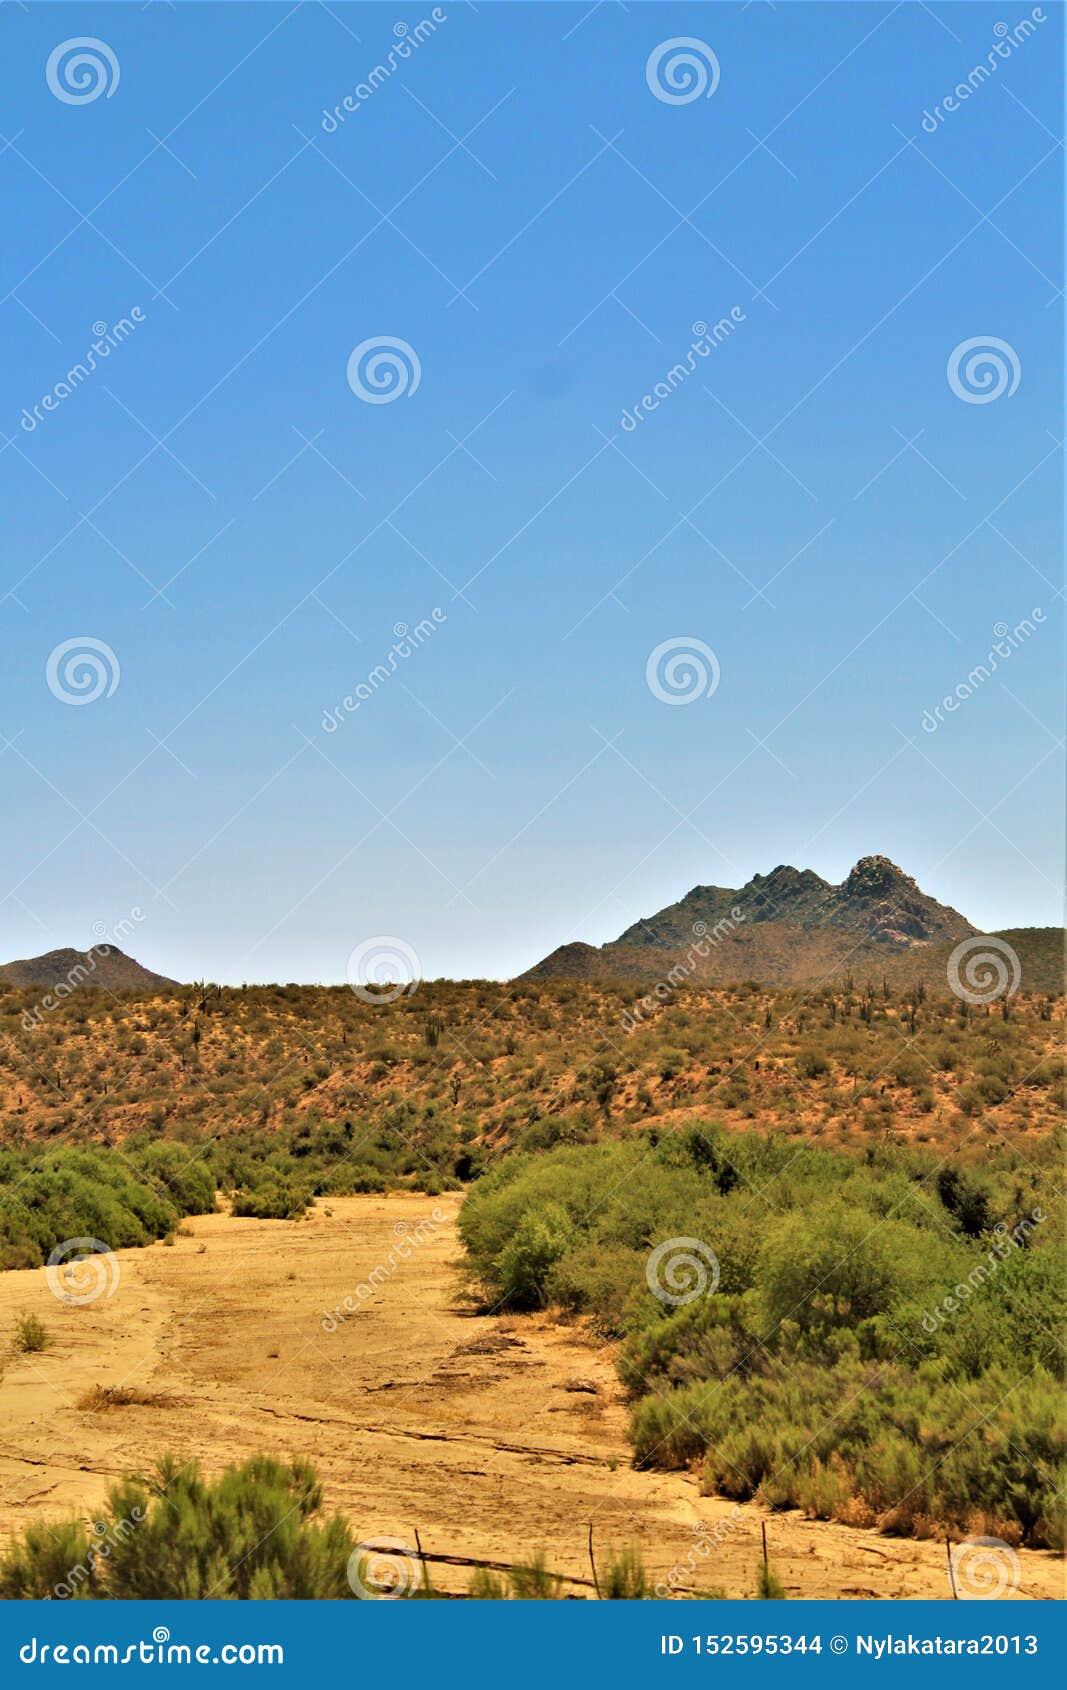 Scenic landscape view Phoenix to Las Vegas, Arizona, United States